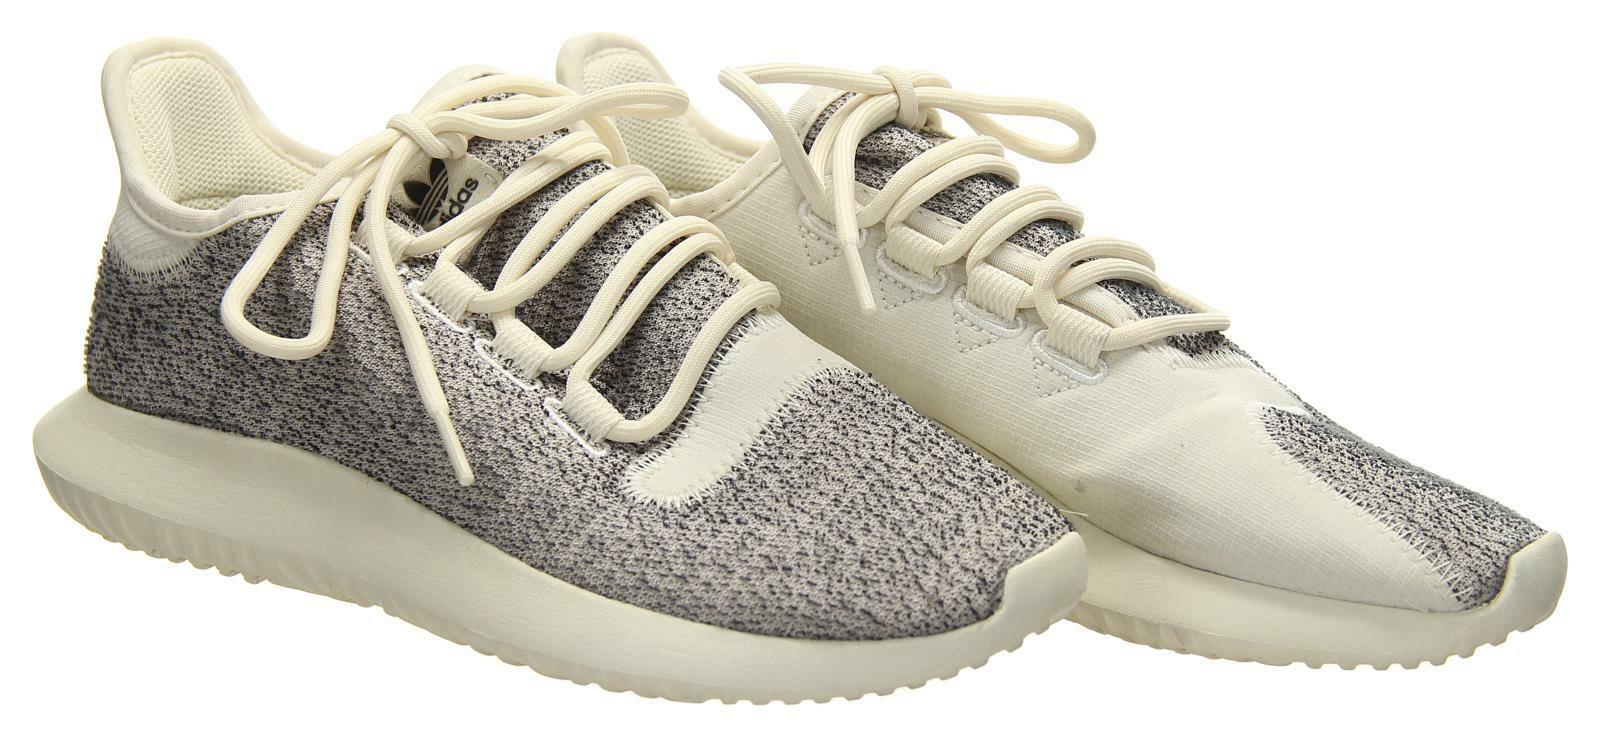 Adidas Tubular Shadow shoes Women's Grey and White Sz 6.5